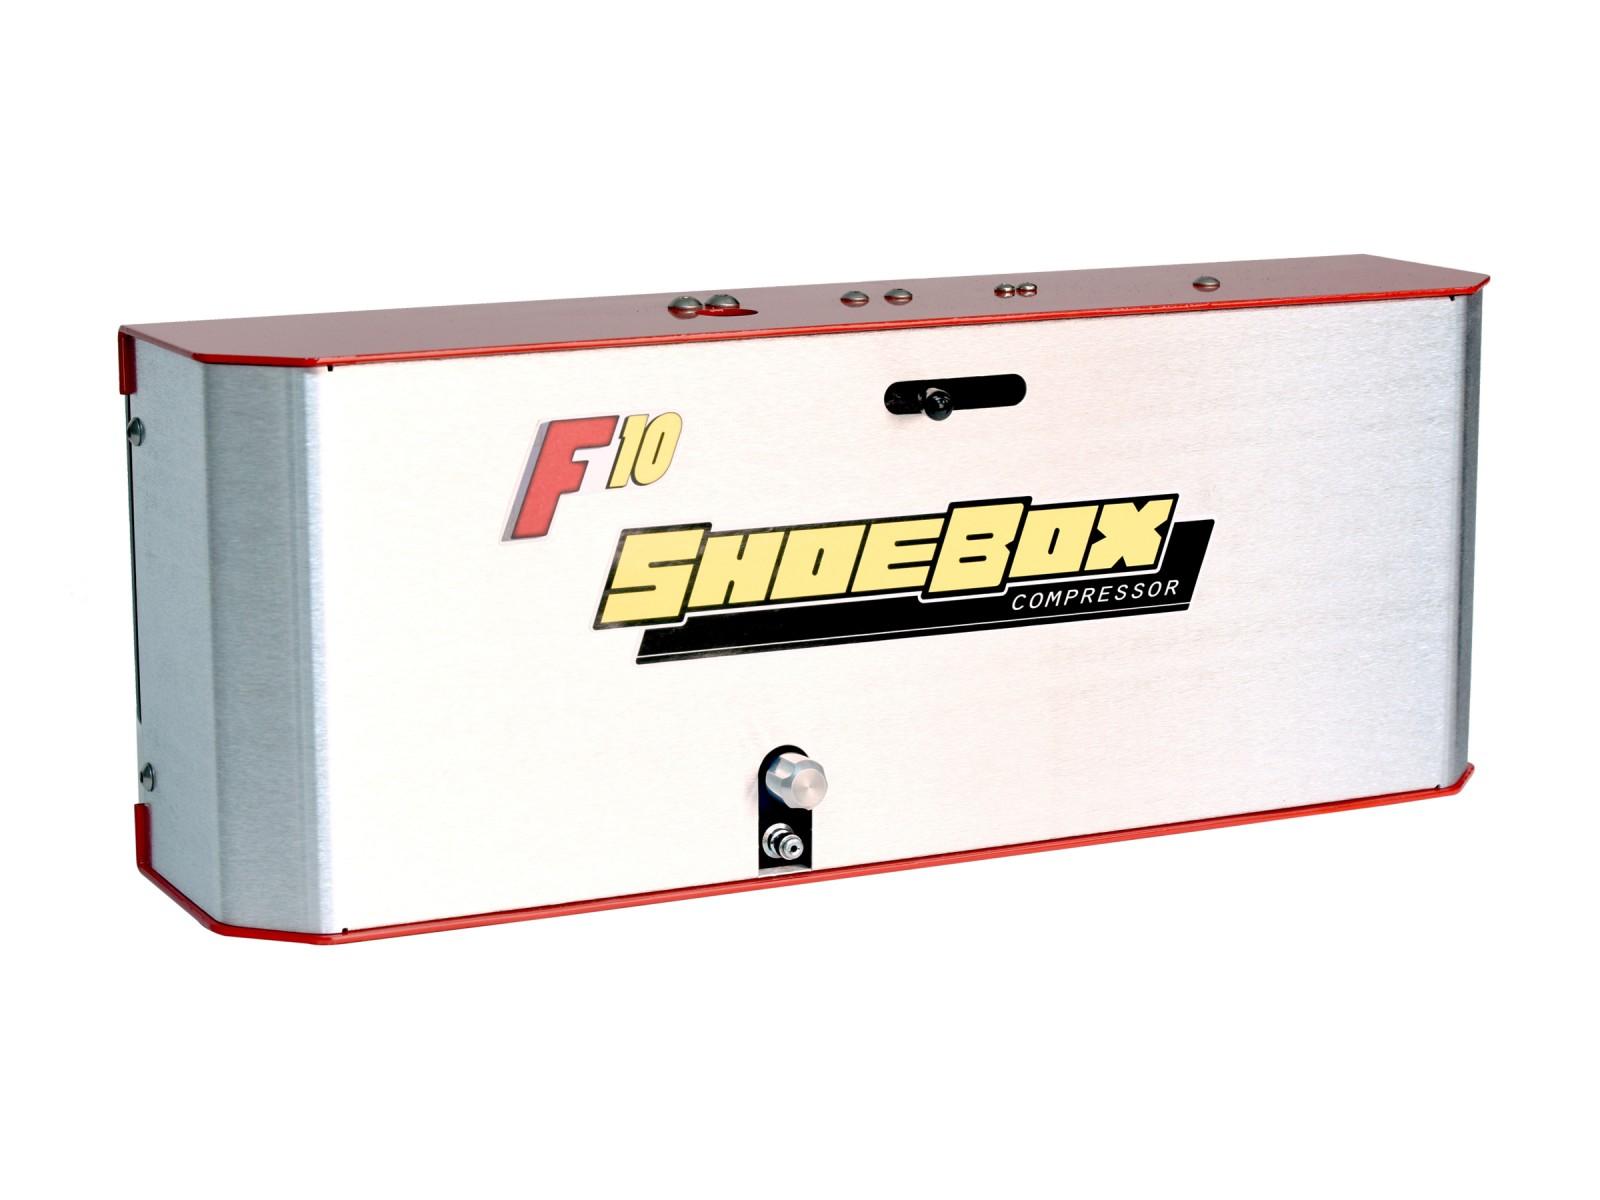 Freedom F10 ShoeBox Electric Air Compressor, Max 4500 PSI